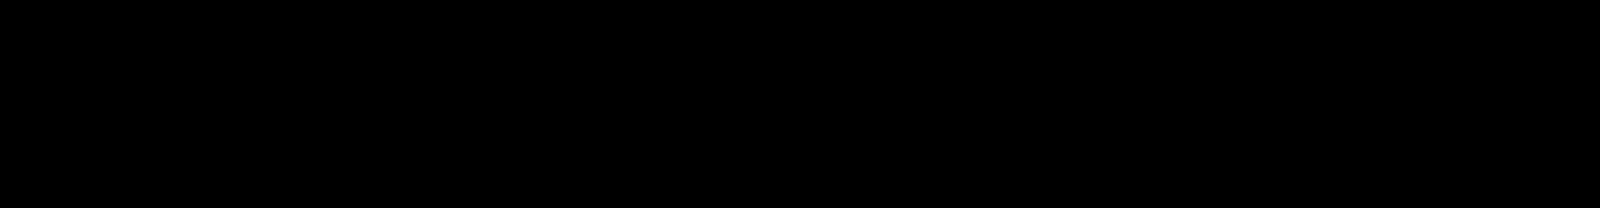 Haloalkanes And Haloarenes Chemistry Notes For Iitjee Neet